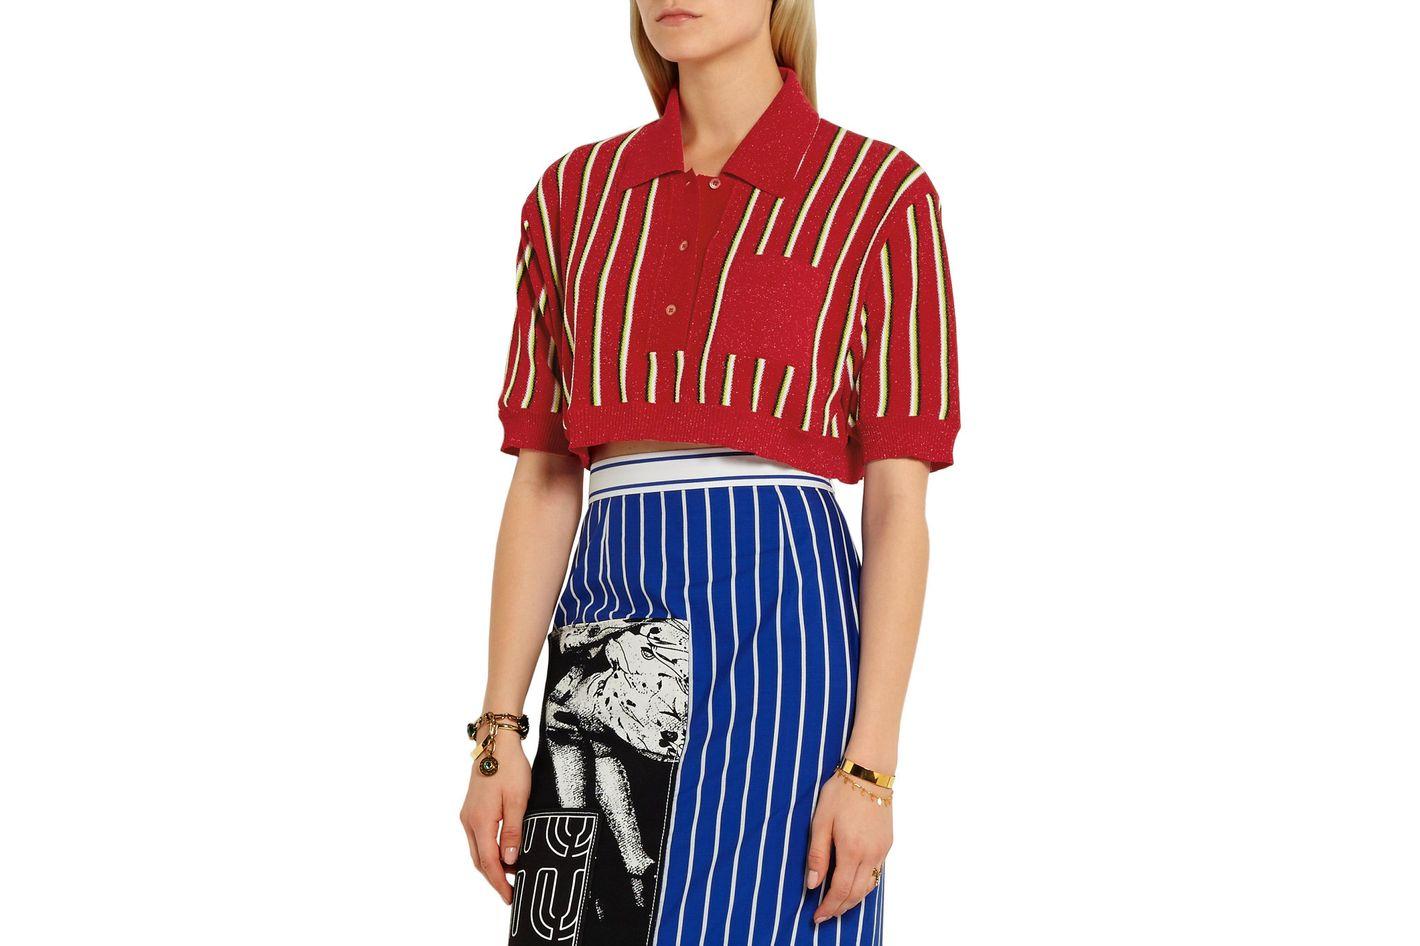 Miu Miu cropped striped metallic knitted top